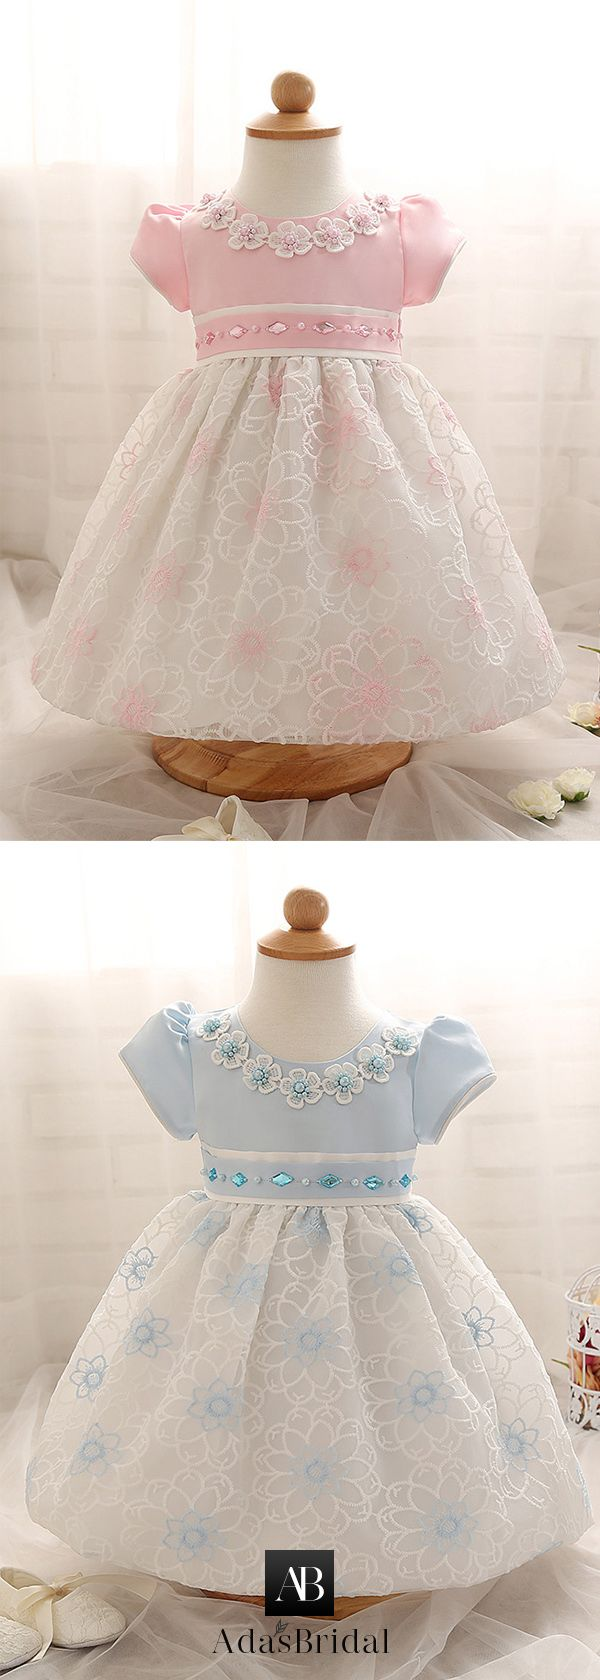 Amazing Satin & Lace Jewel Neckline Ball Gown Flower Girl Dresses With Rhinestones